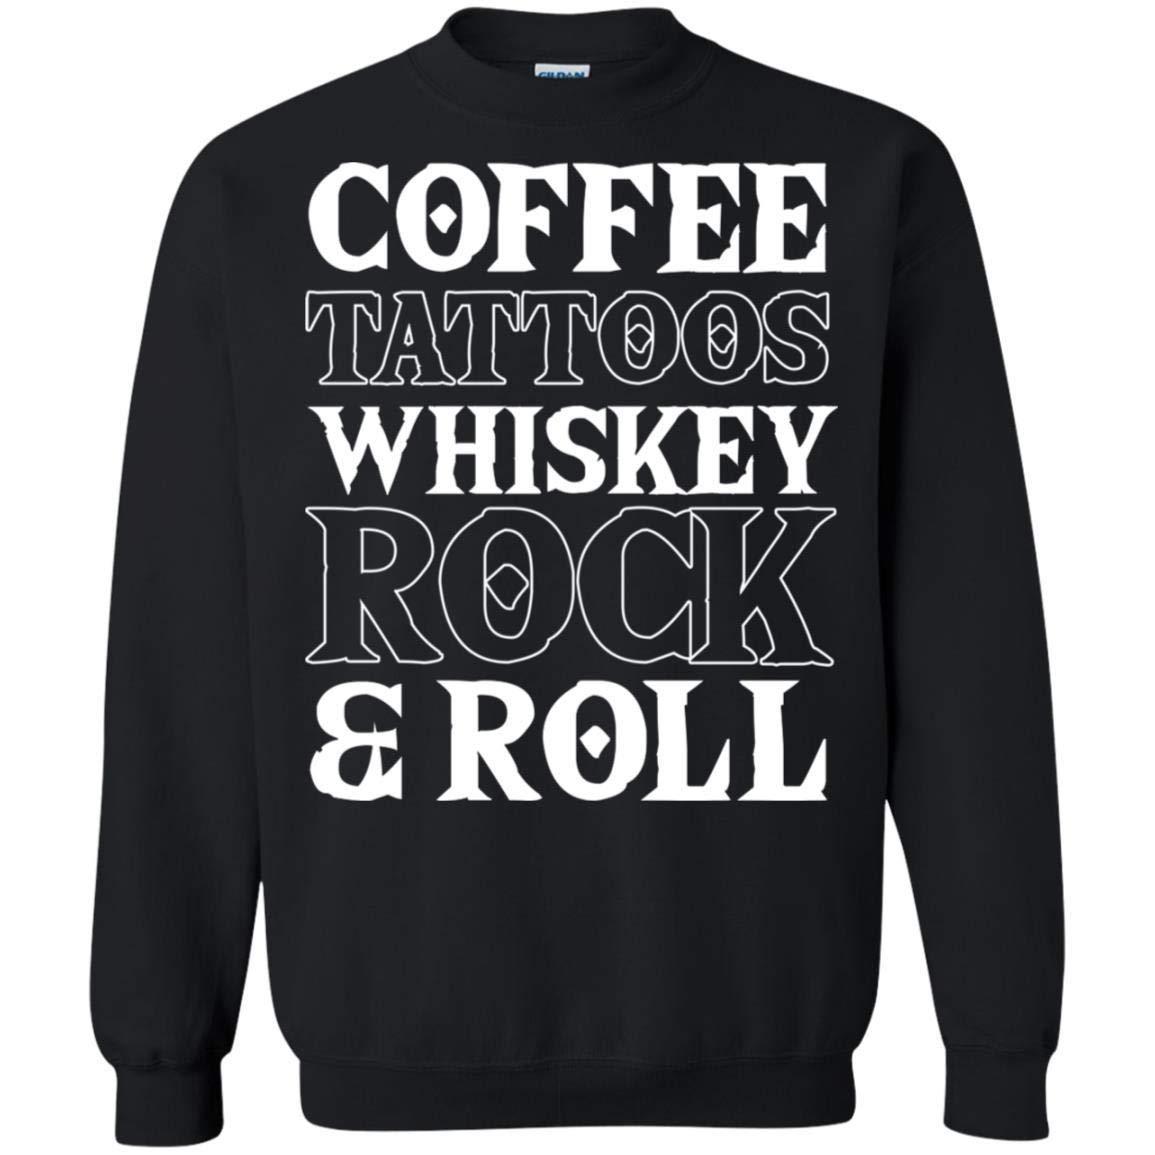 Coffee Tattoos Whiskey Rock /& Roll Unisex Sweatshirt tee